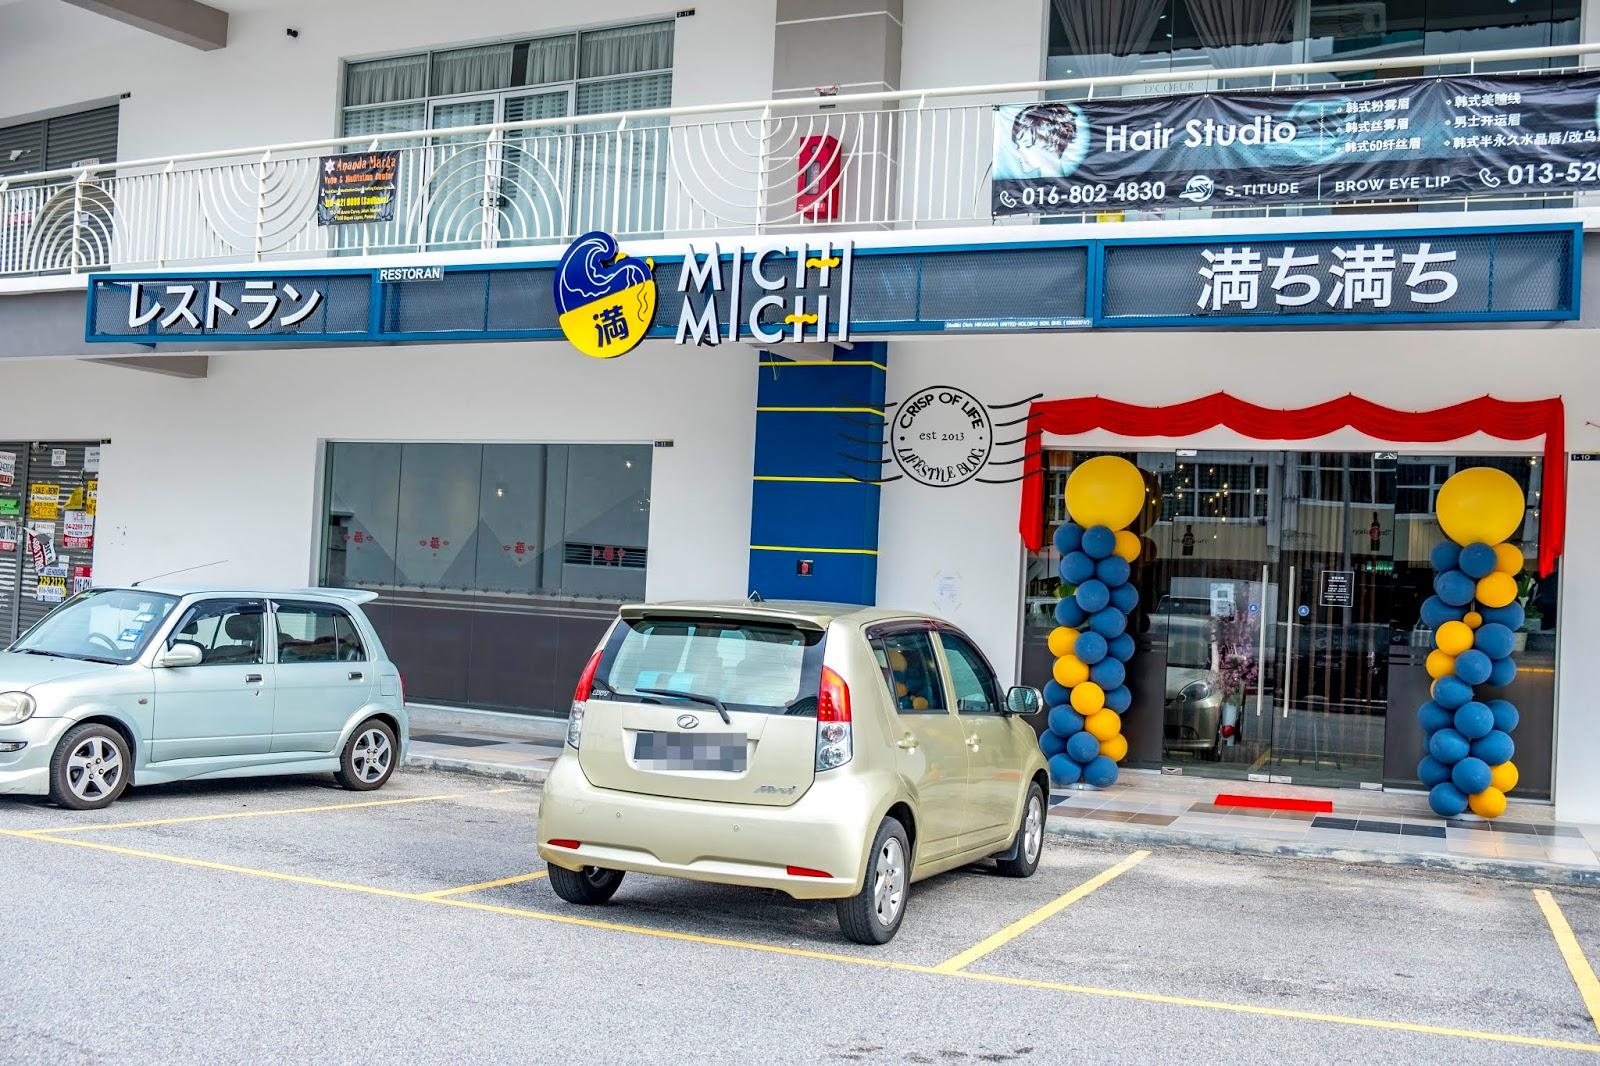 Michi Michi at Arena Curve, Bayan Lepas, Penang